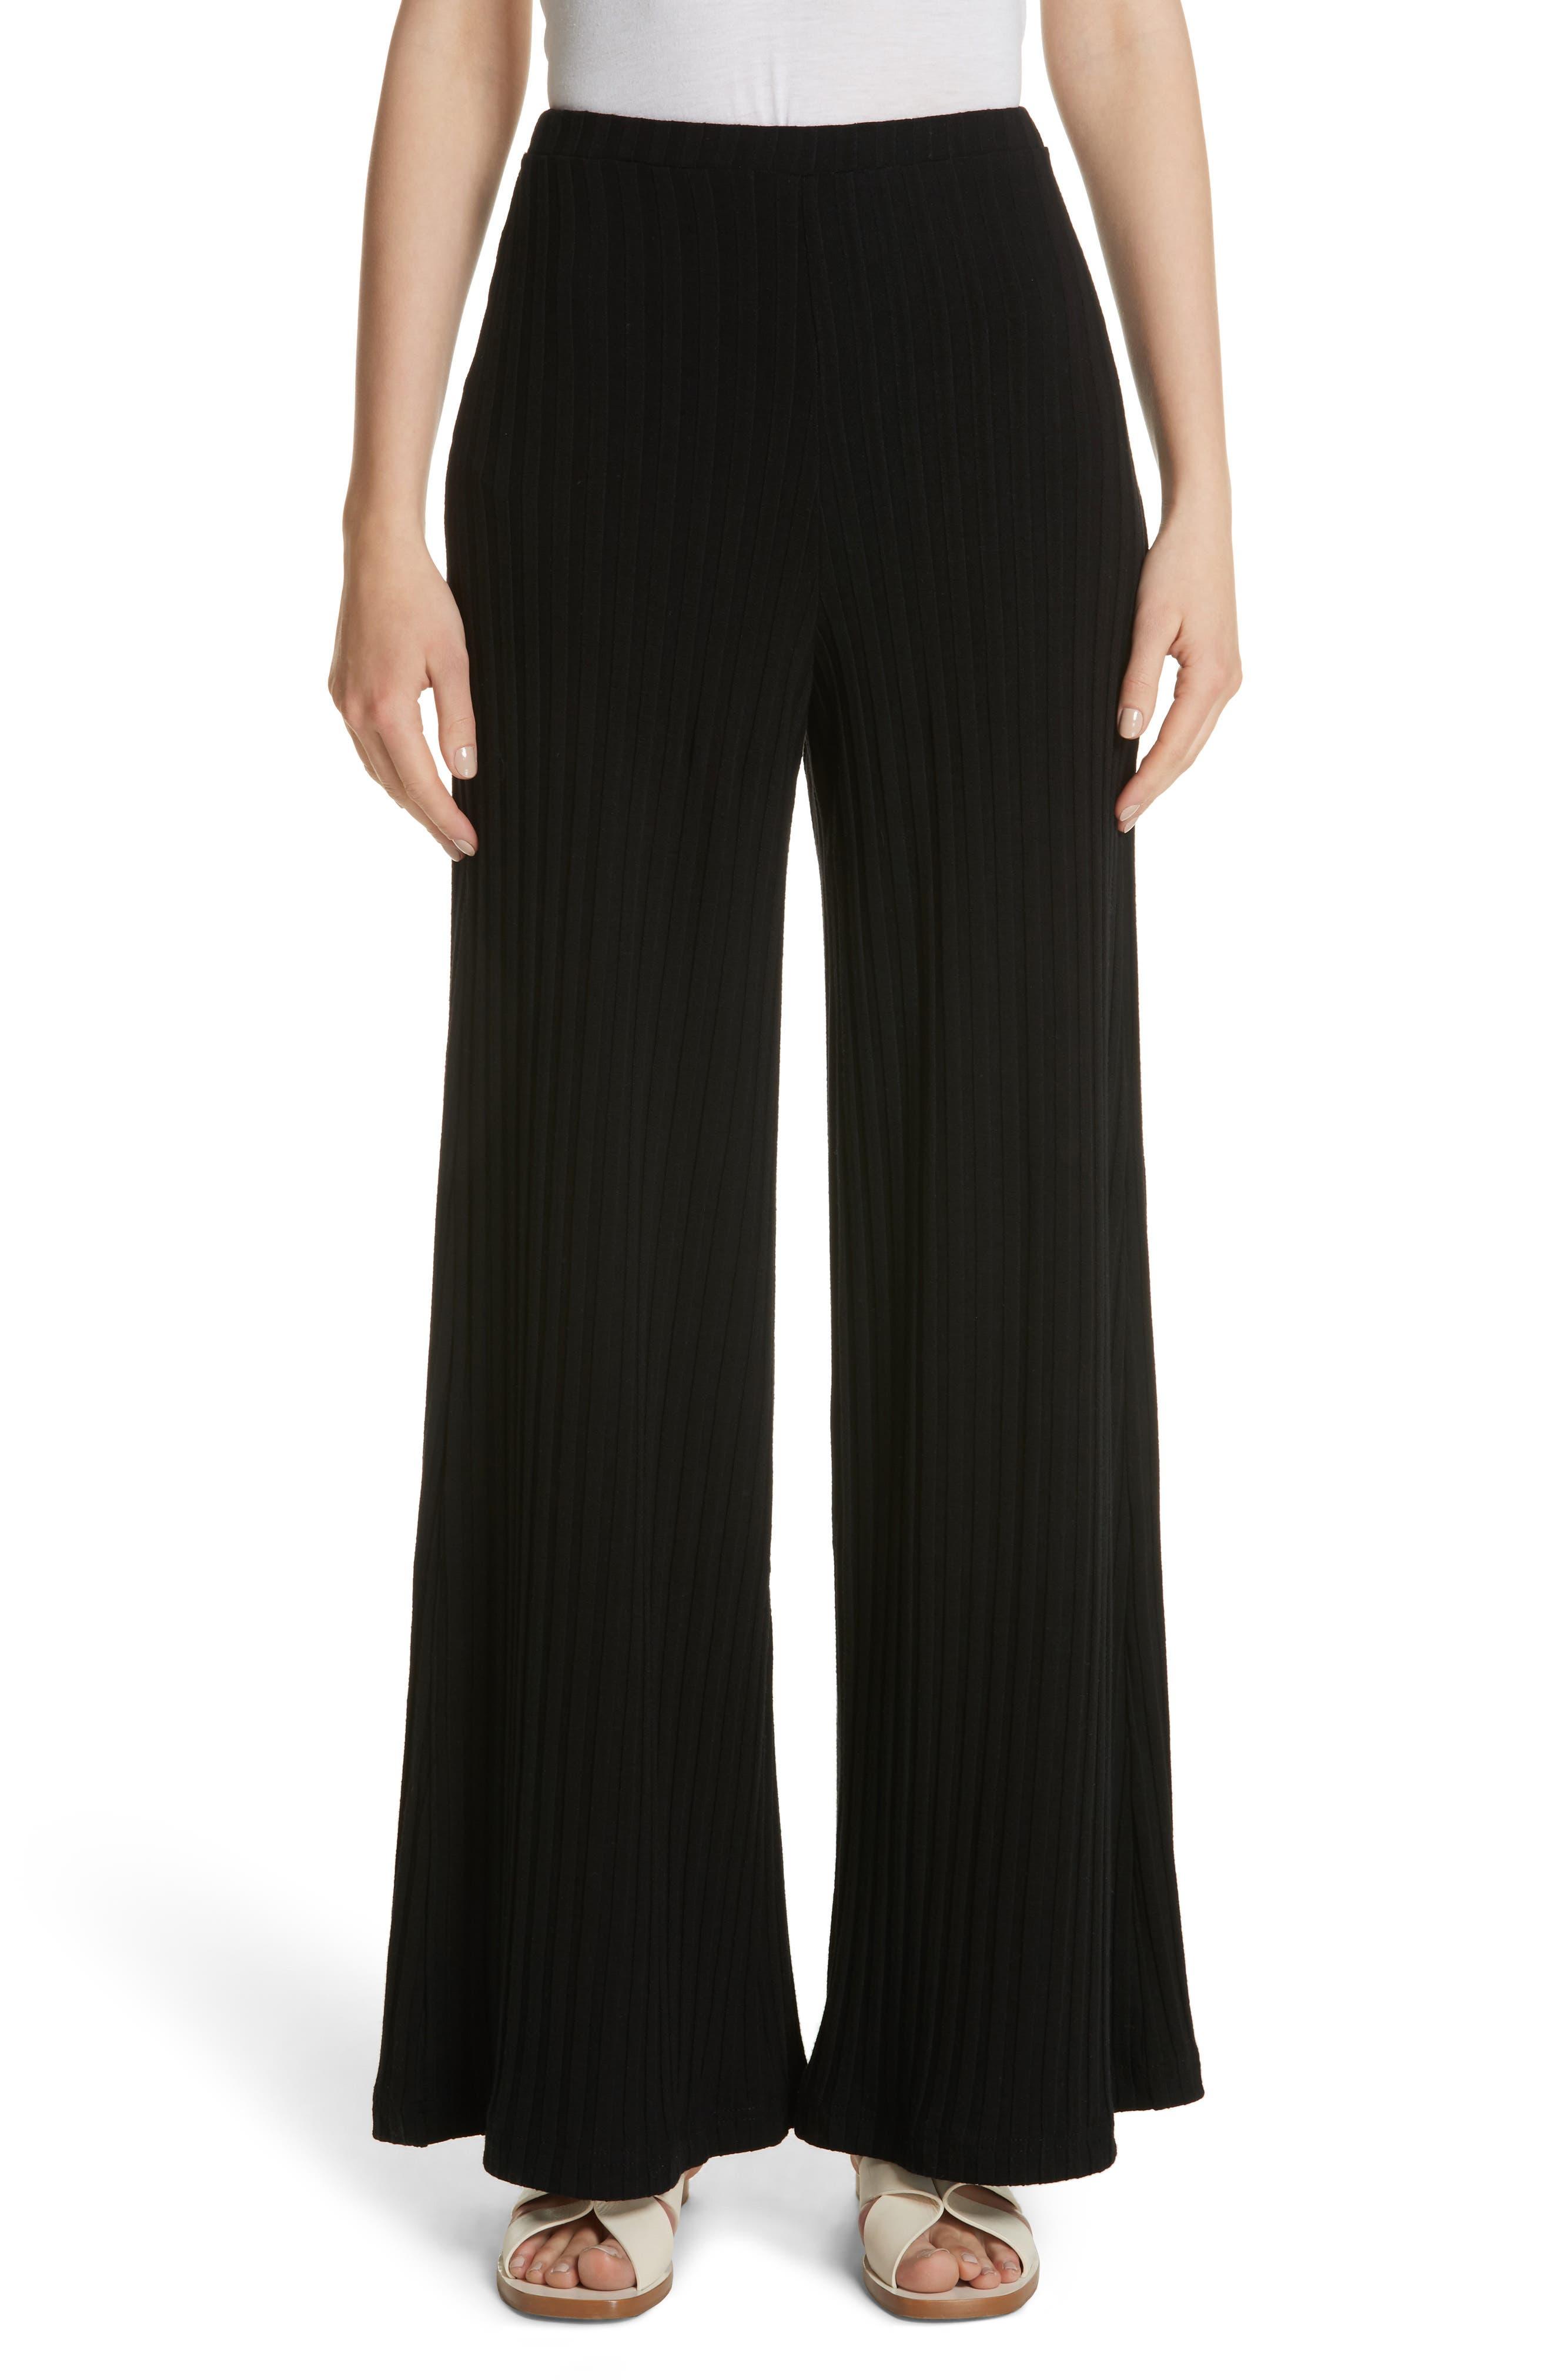 Rian Ribbed Bell Bottom Pants,                         Main,                         color, Black